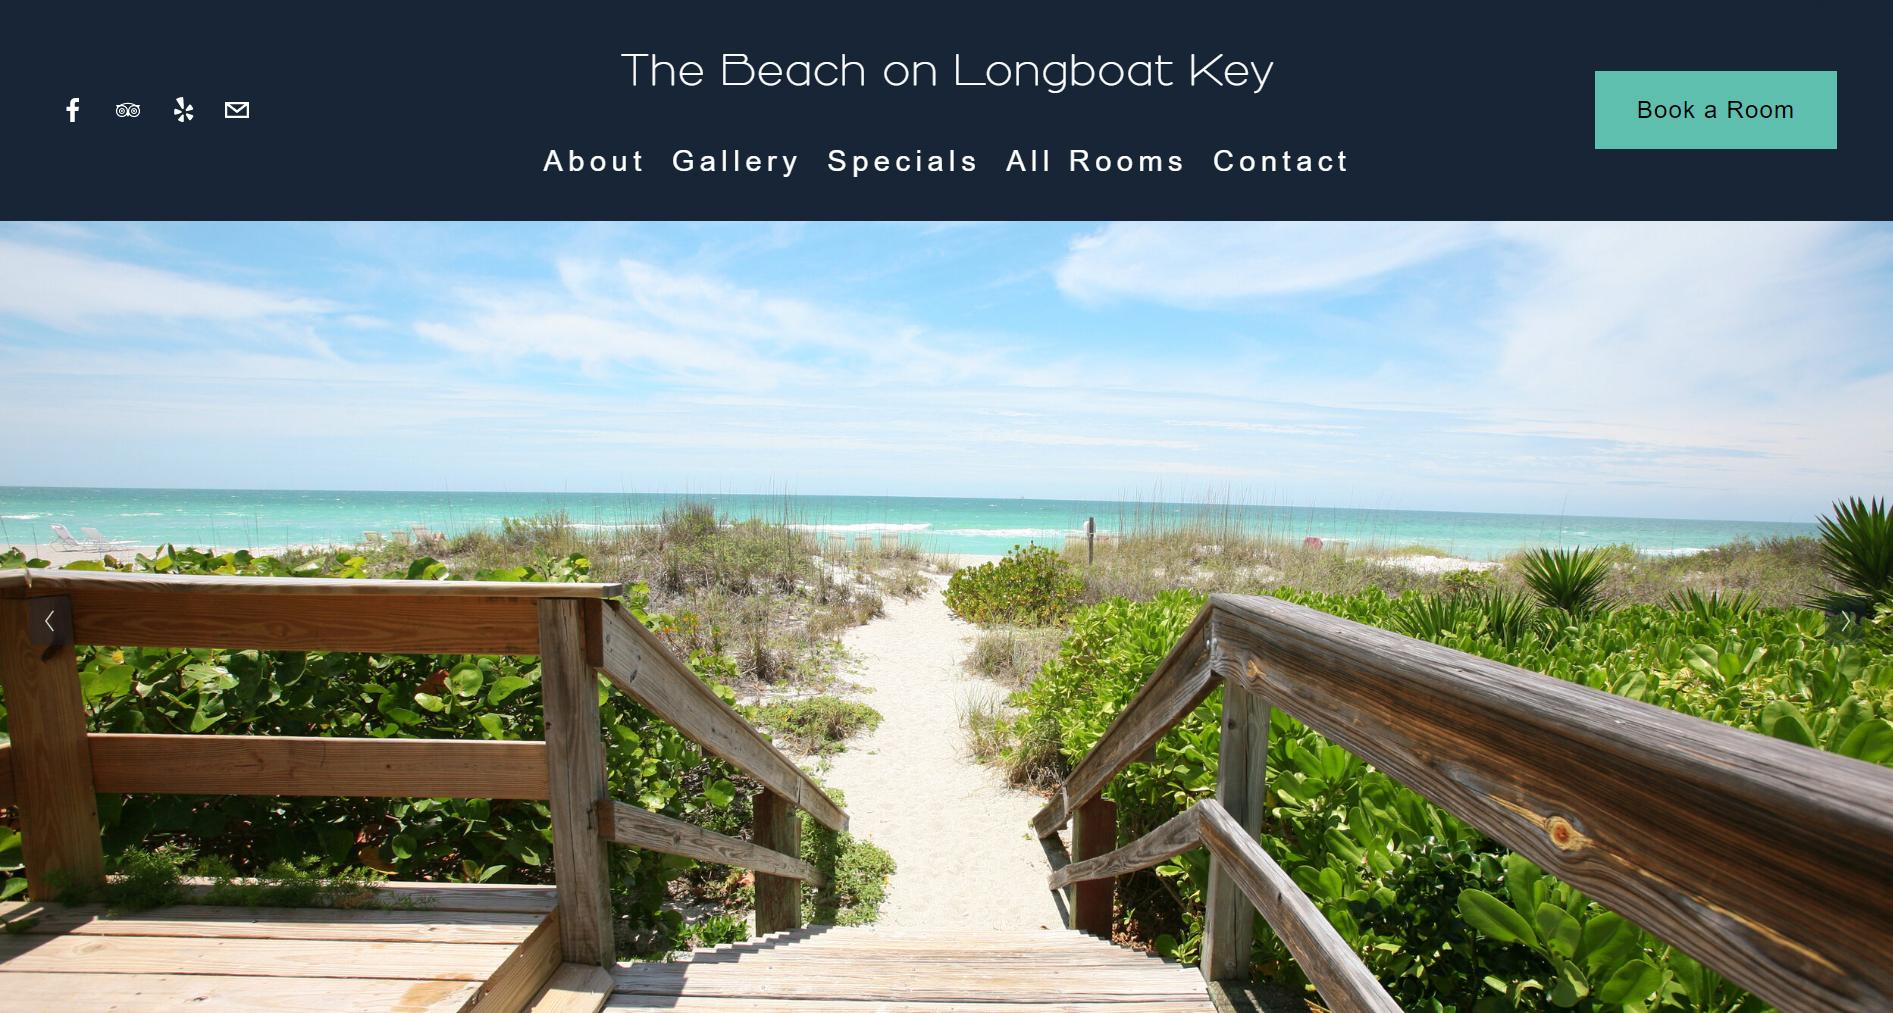 The Beach on Longboat Key New Website